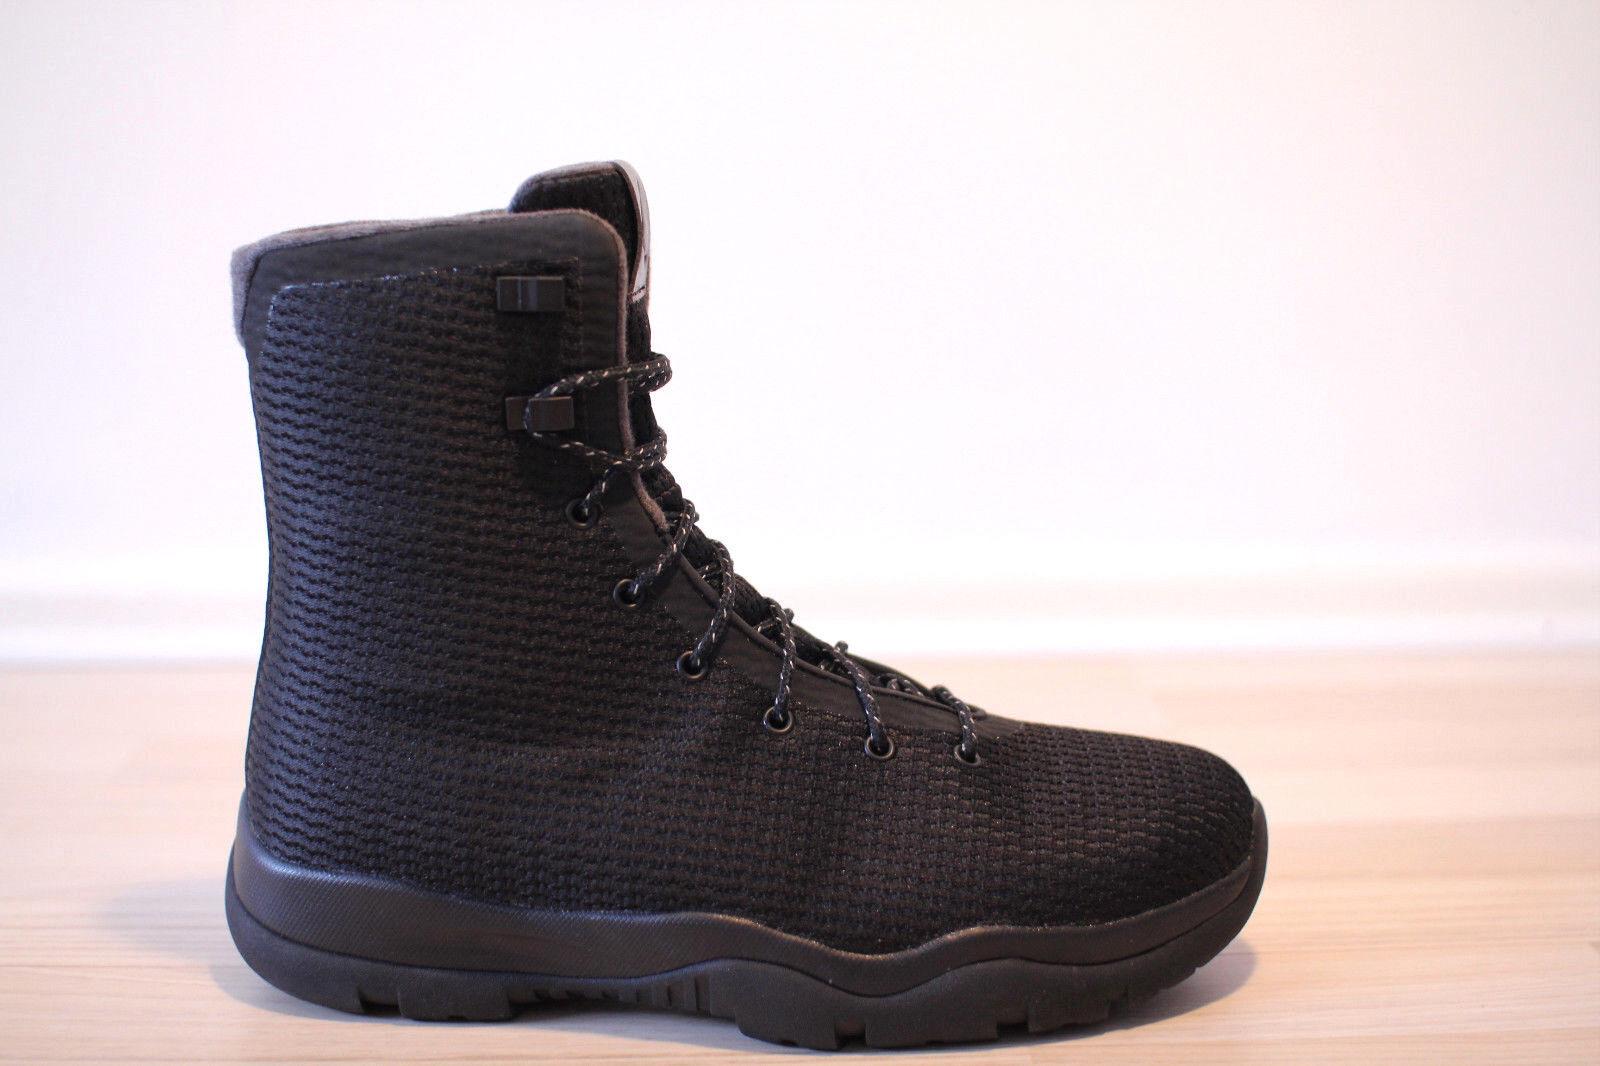 Nike Jordan Future Boot Winterstiefel Schwarz Gr. 40,41,44,45 NEU & OVP